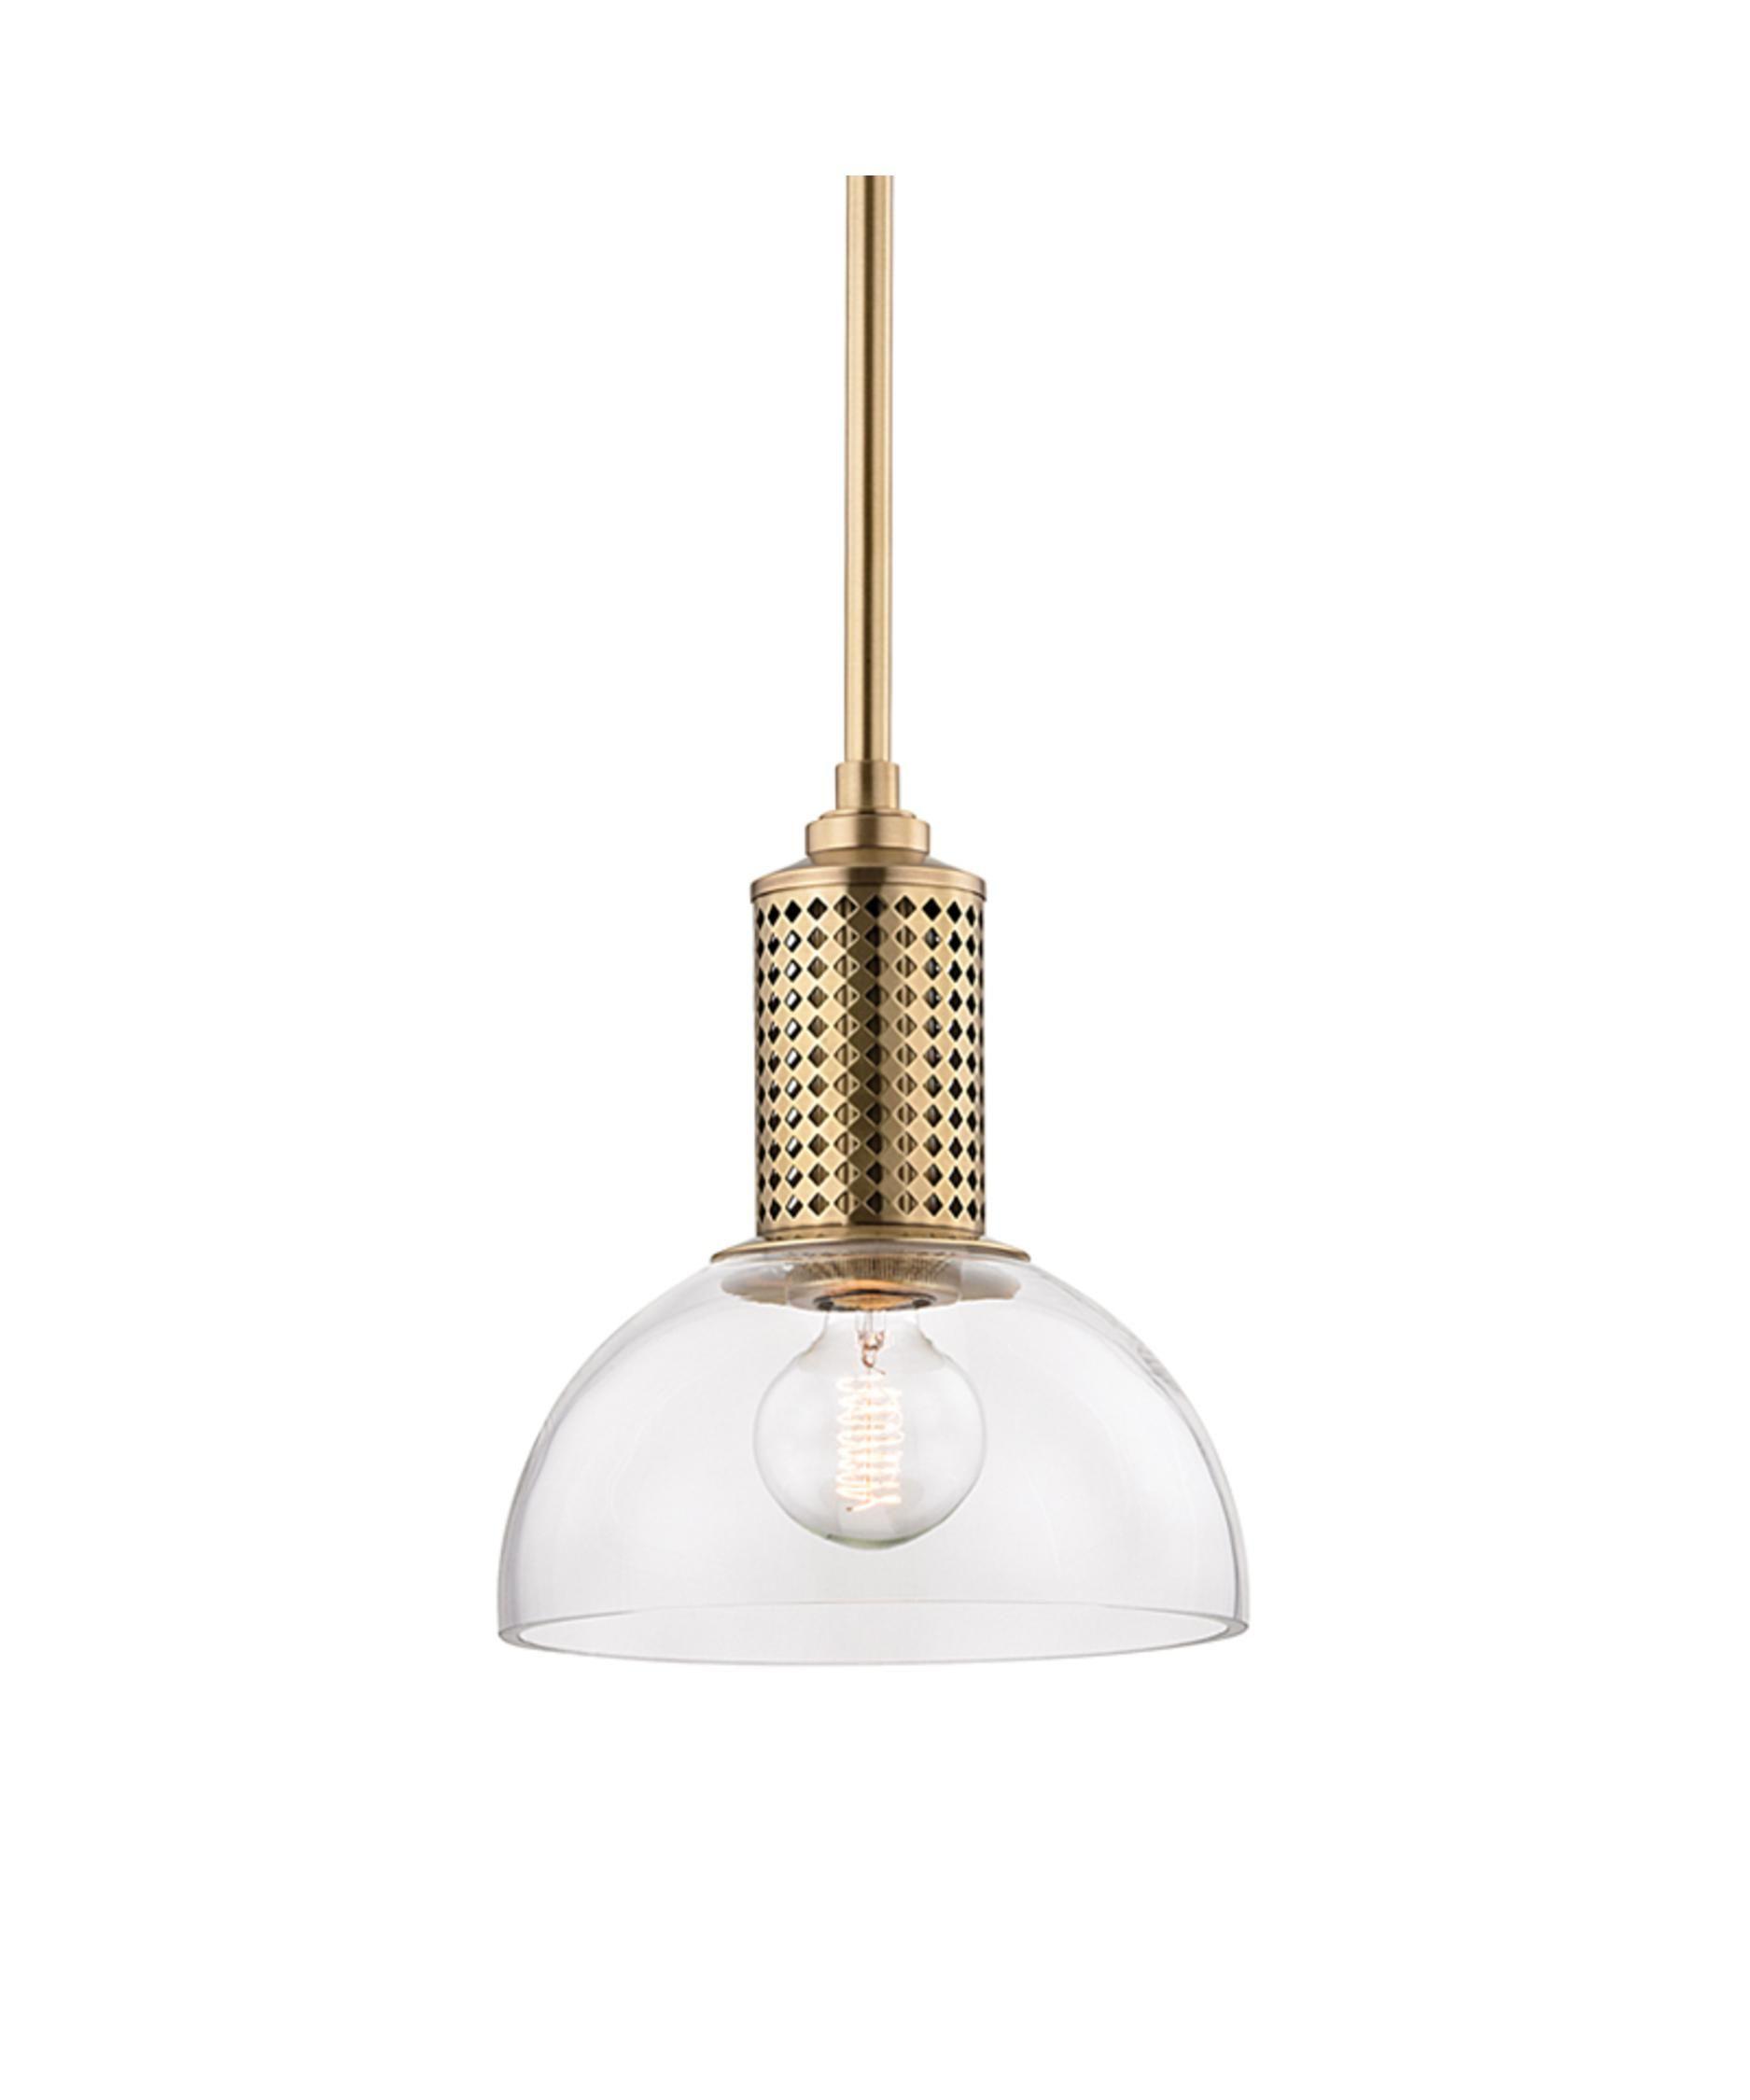 Hudson Valley 7210 Halcyon 10 Inch Mini Pendant| Capitol Lighting 1  800lighting.$ 305 US? Nice Design